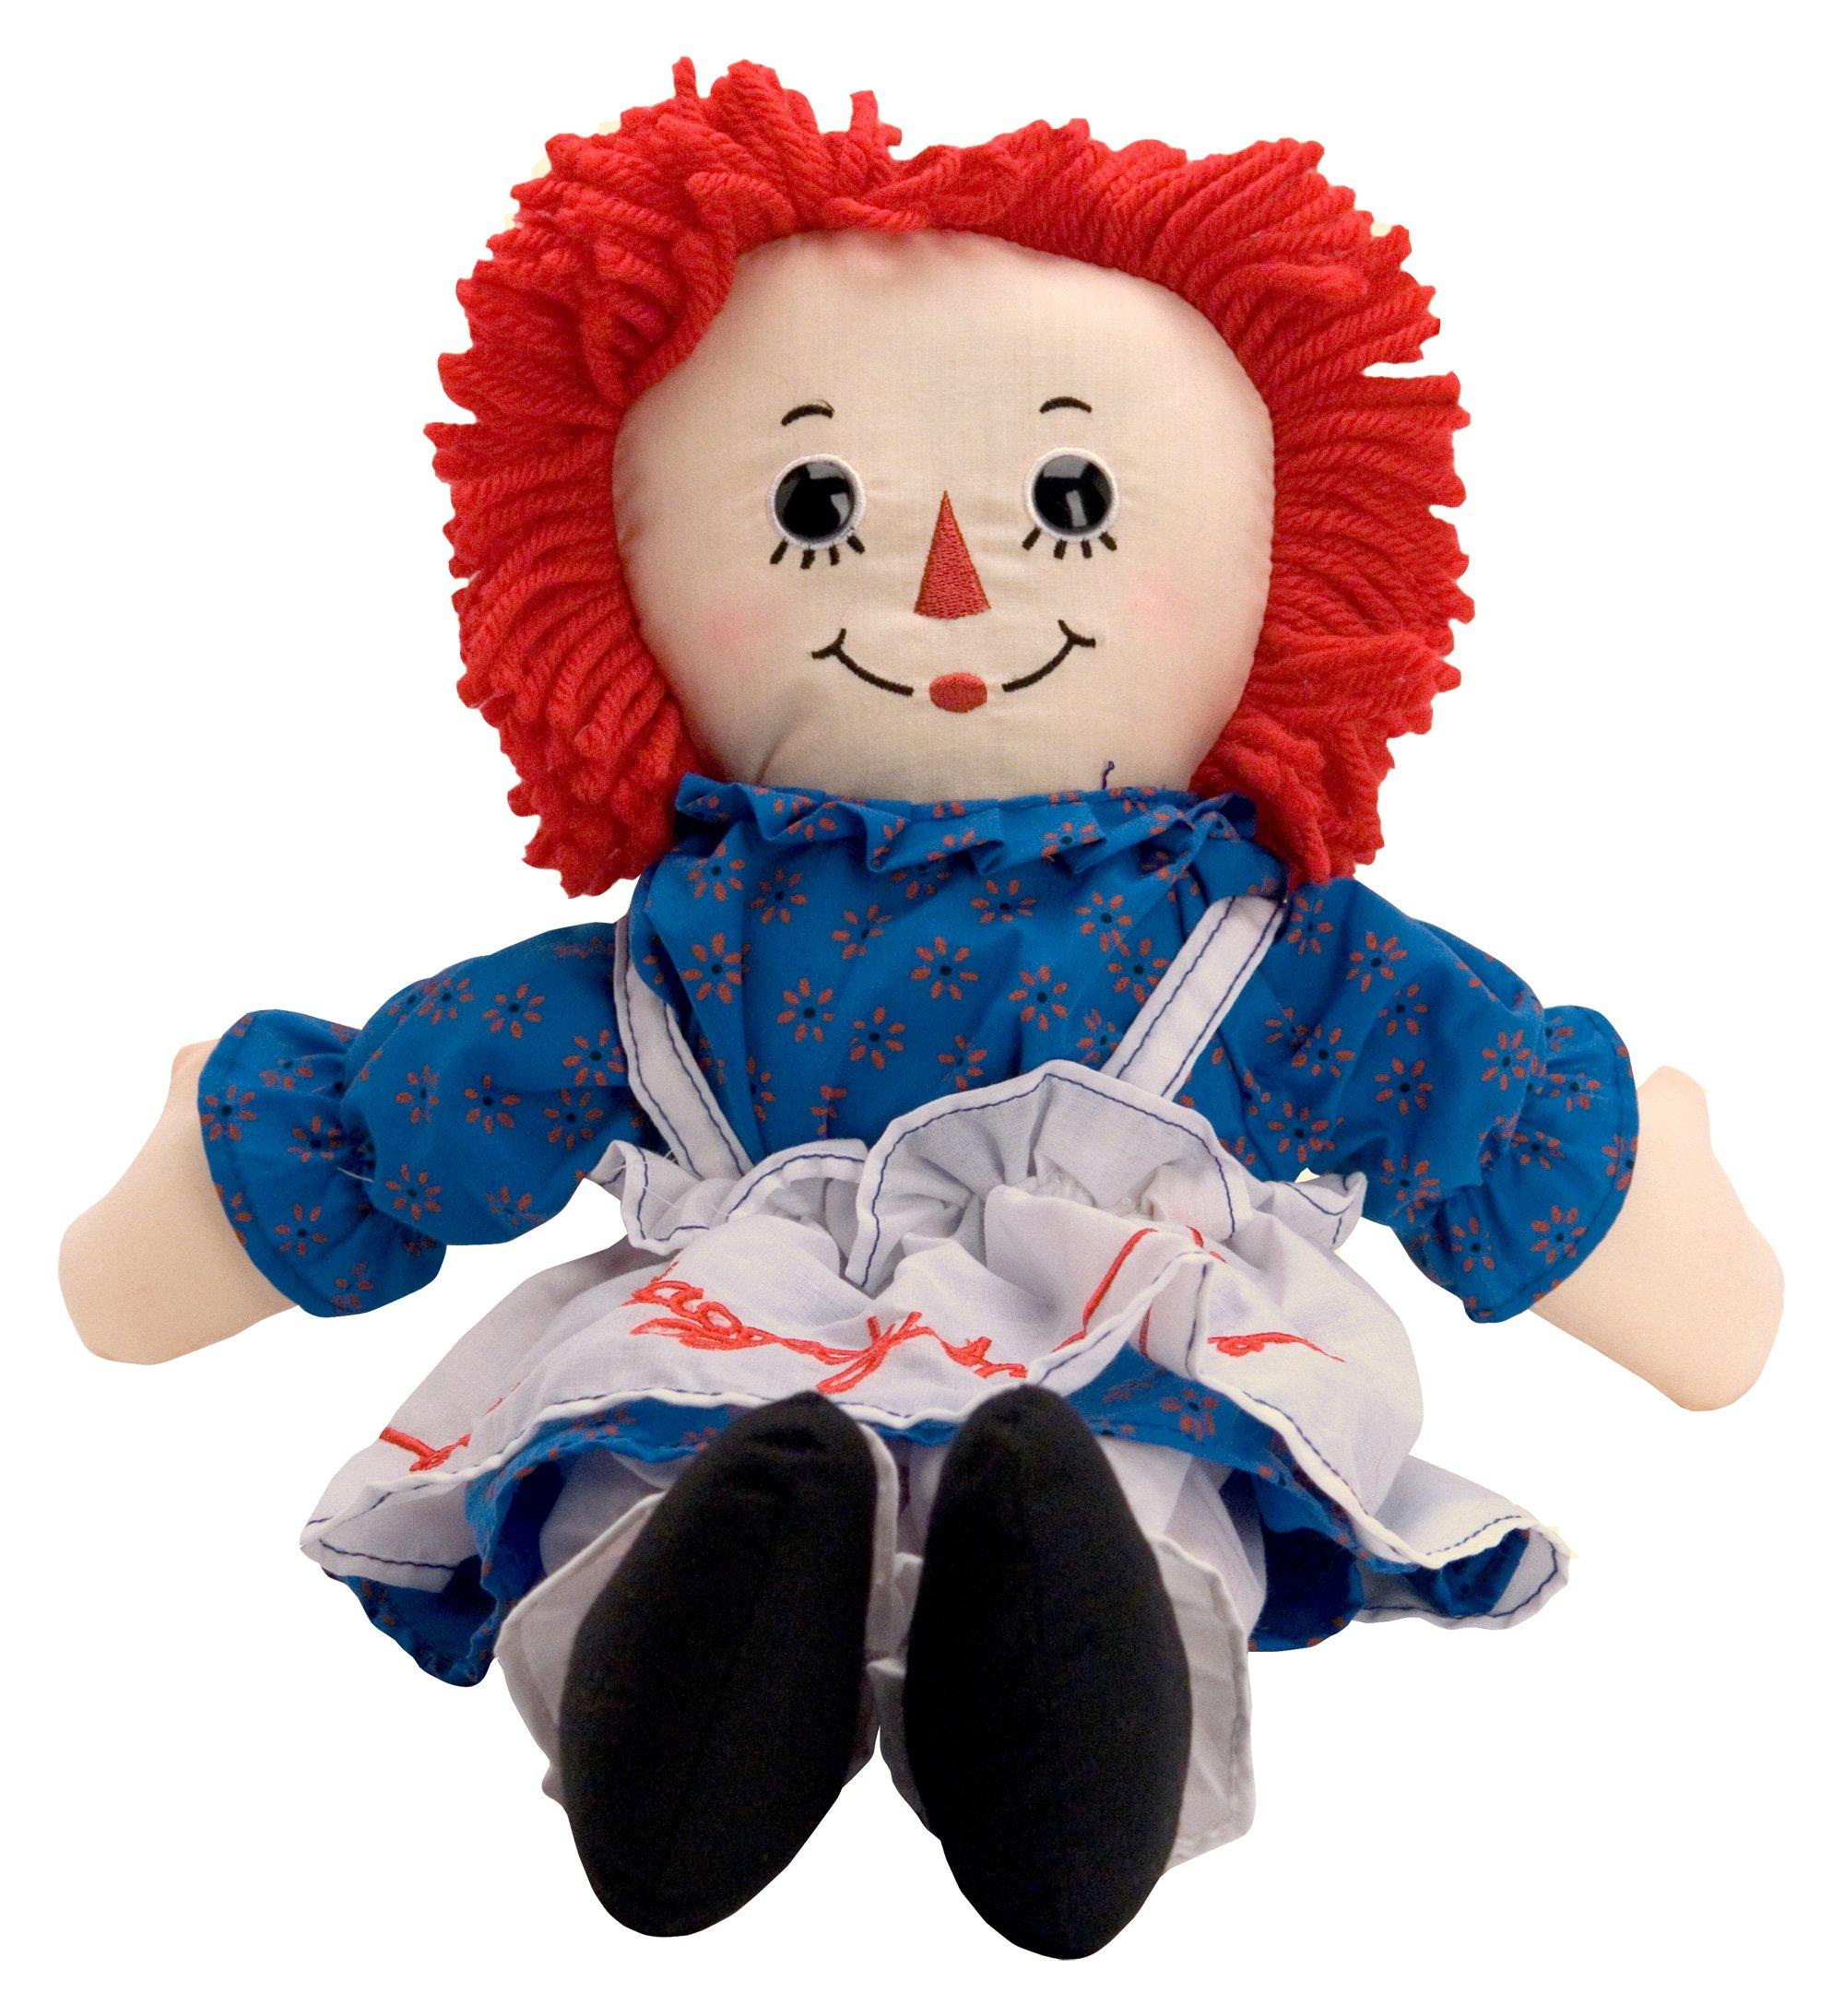 raggedy ann soft doll toys games toys dolls doll accessories